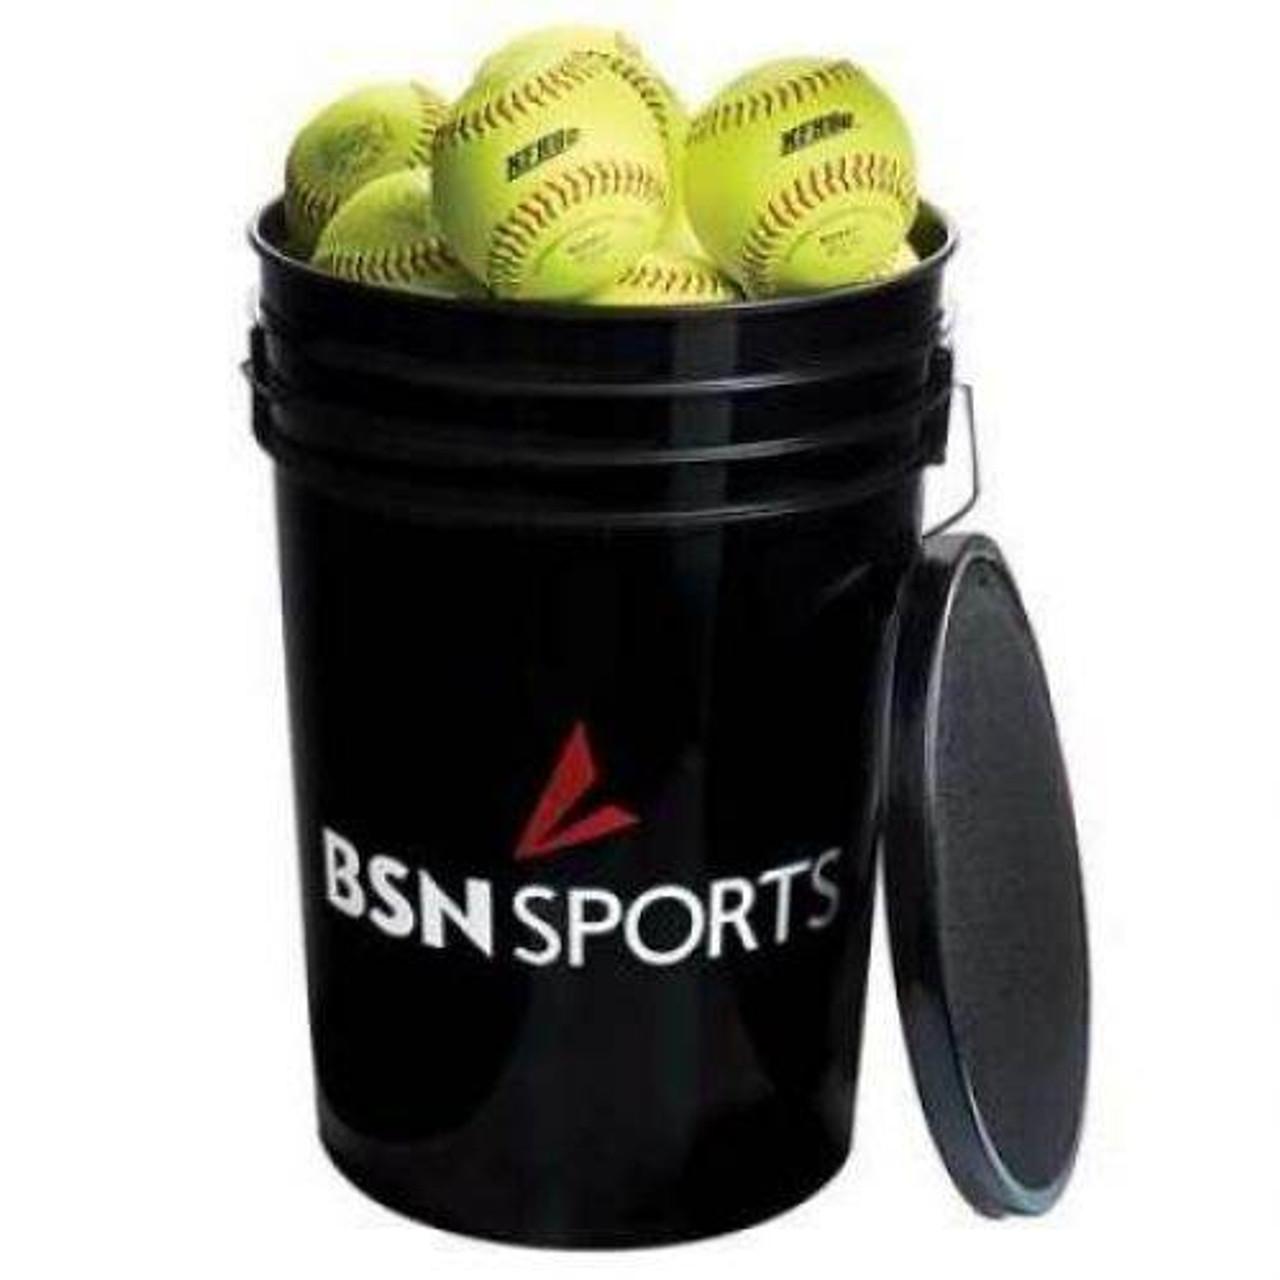 "BSN SPORTS Bucket w/2 dz 11"" Softballs"